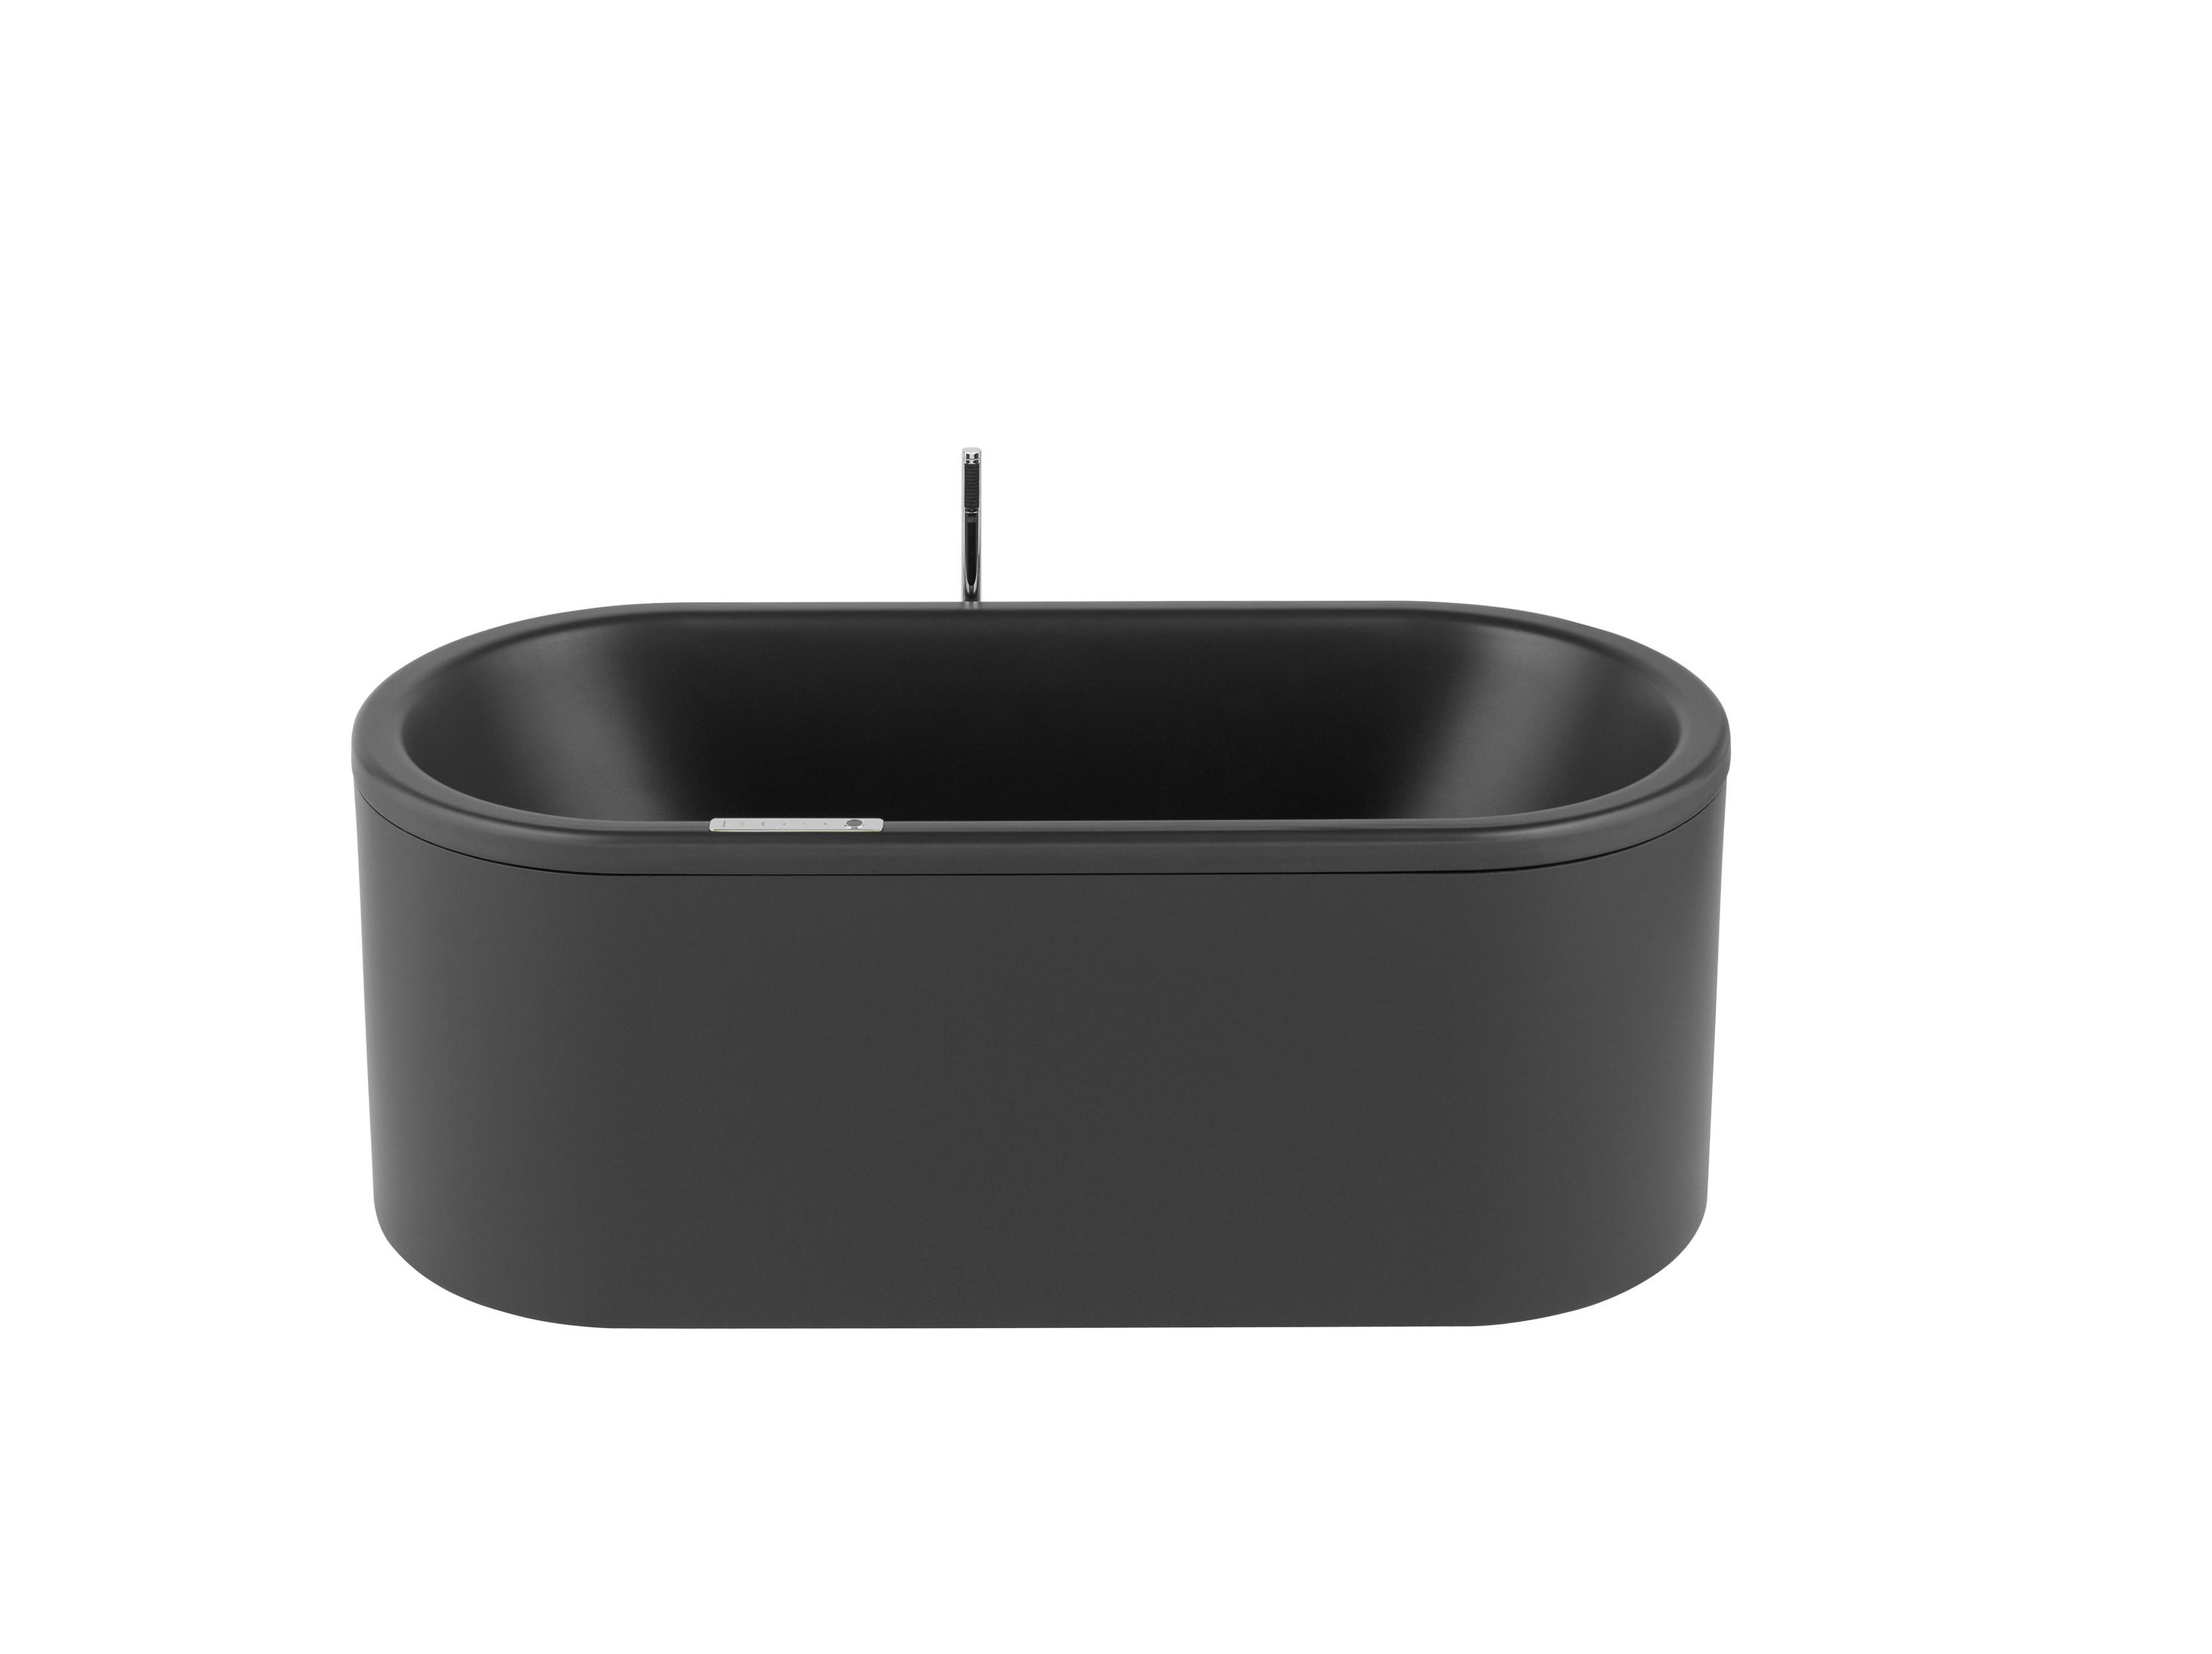 kaldewei 404 iconic bathroom solutions. Black Bedroom Furniture Sets. Home Design Ideas